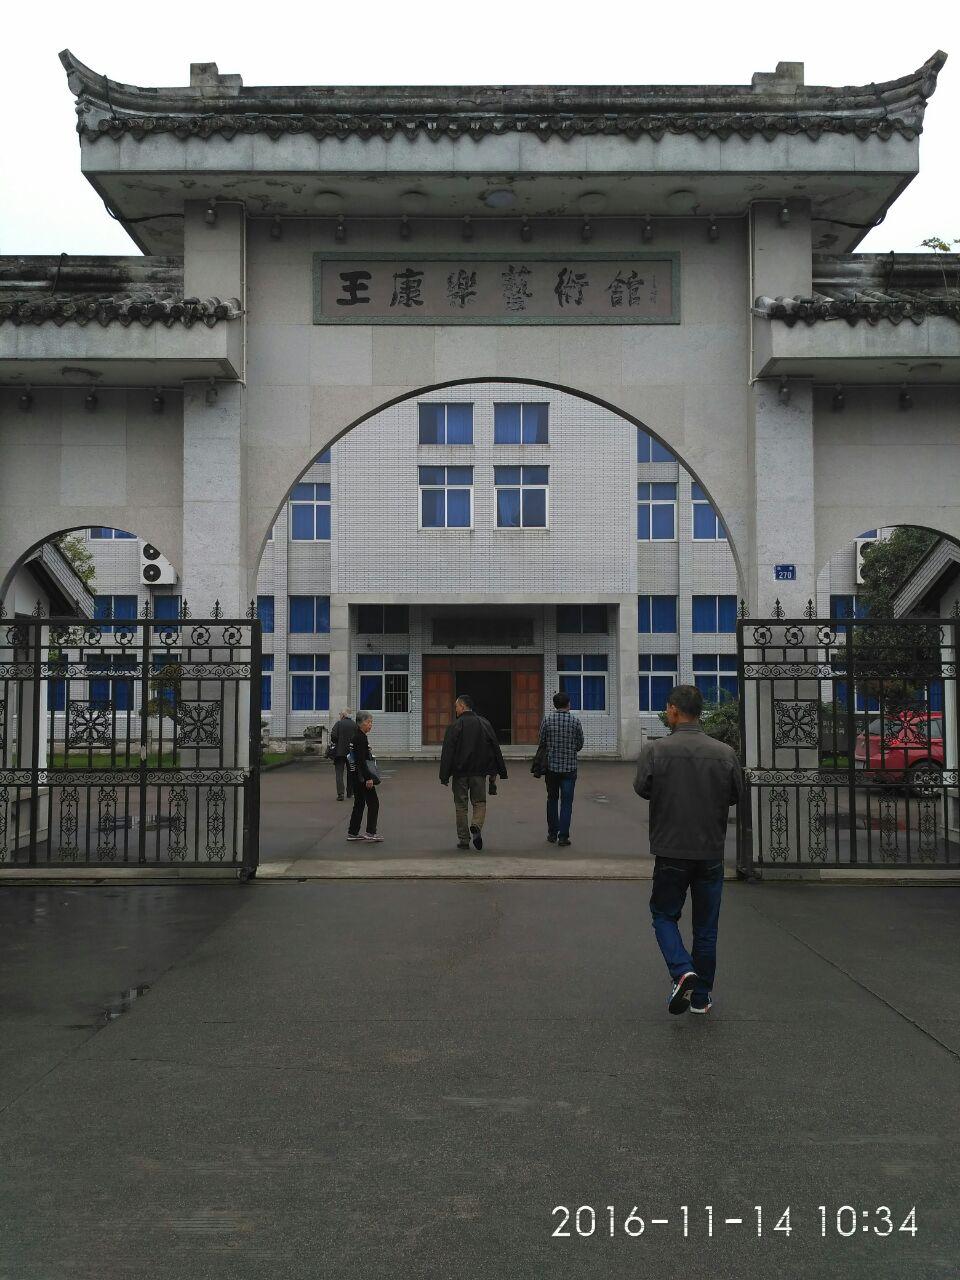 Wangkangle Art Gallery